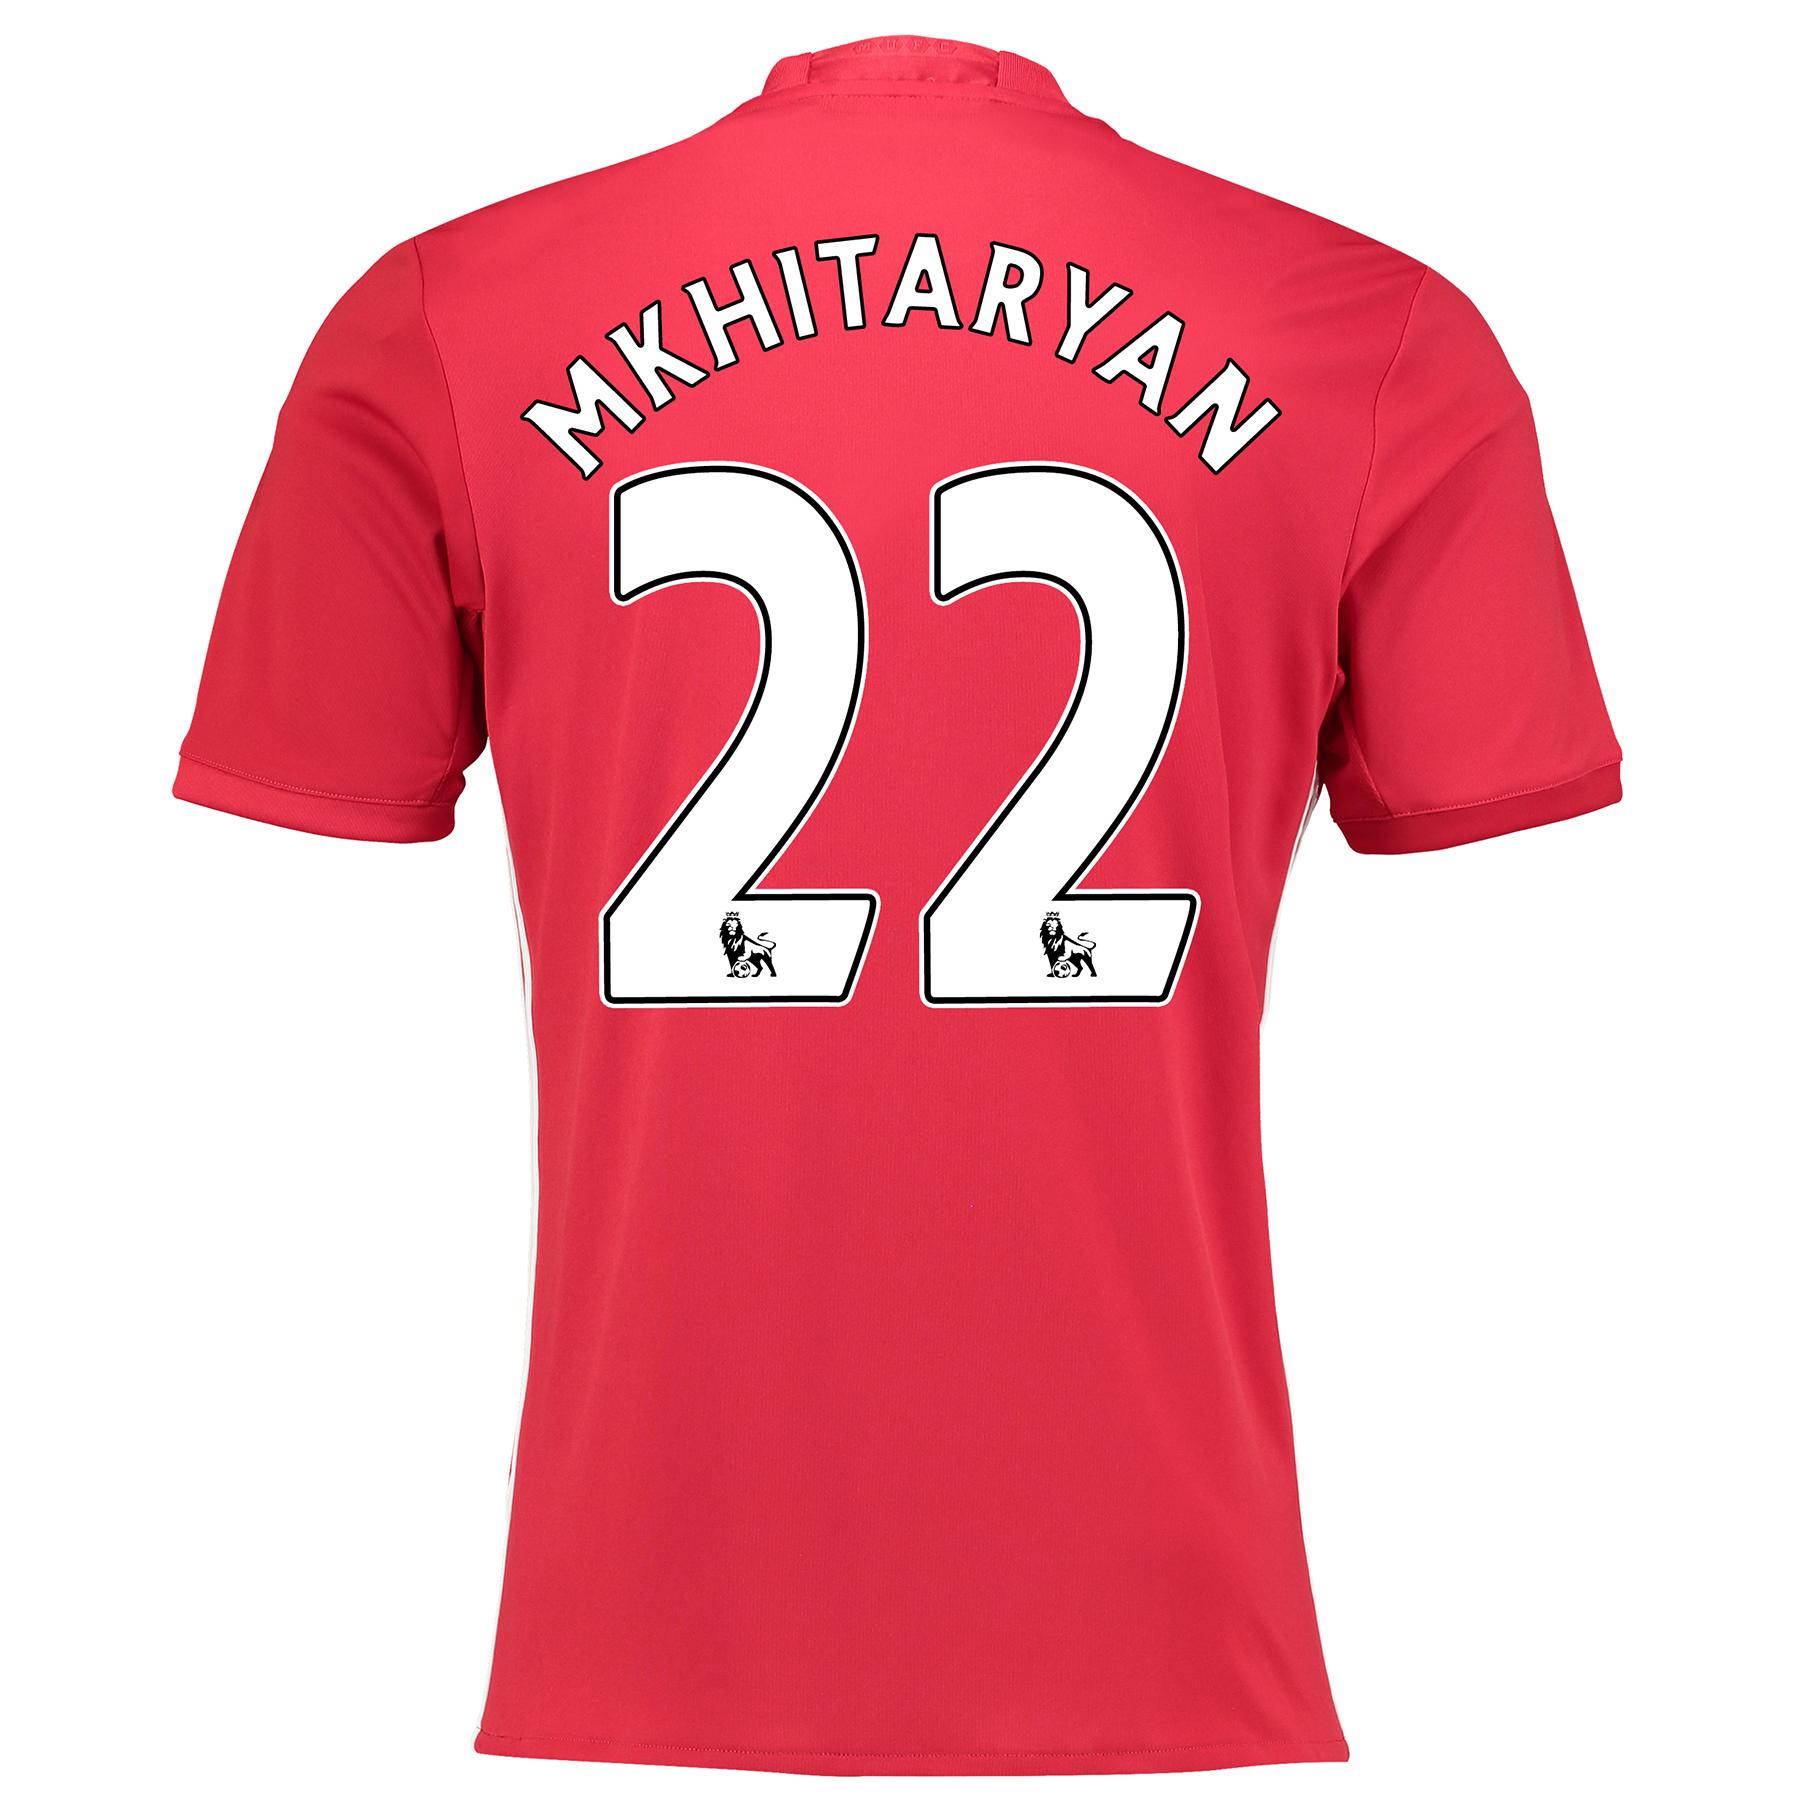 Manchester United Home Shirt 2016-17 with Mkhitaryan 22 printing